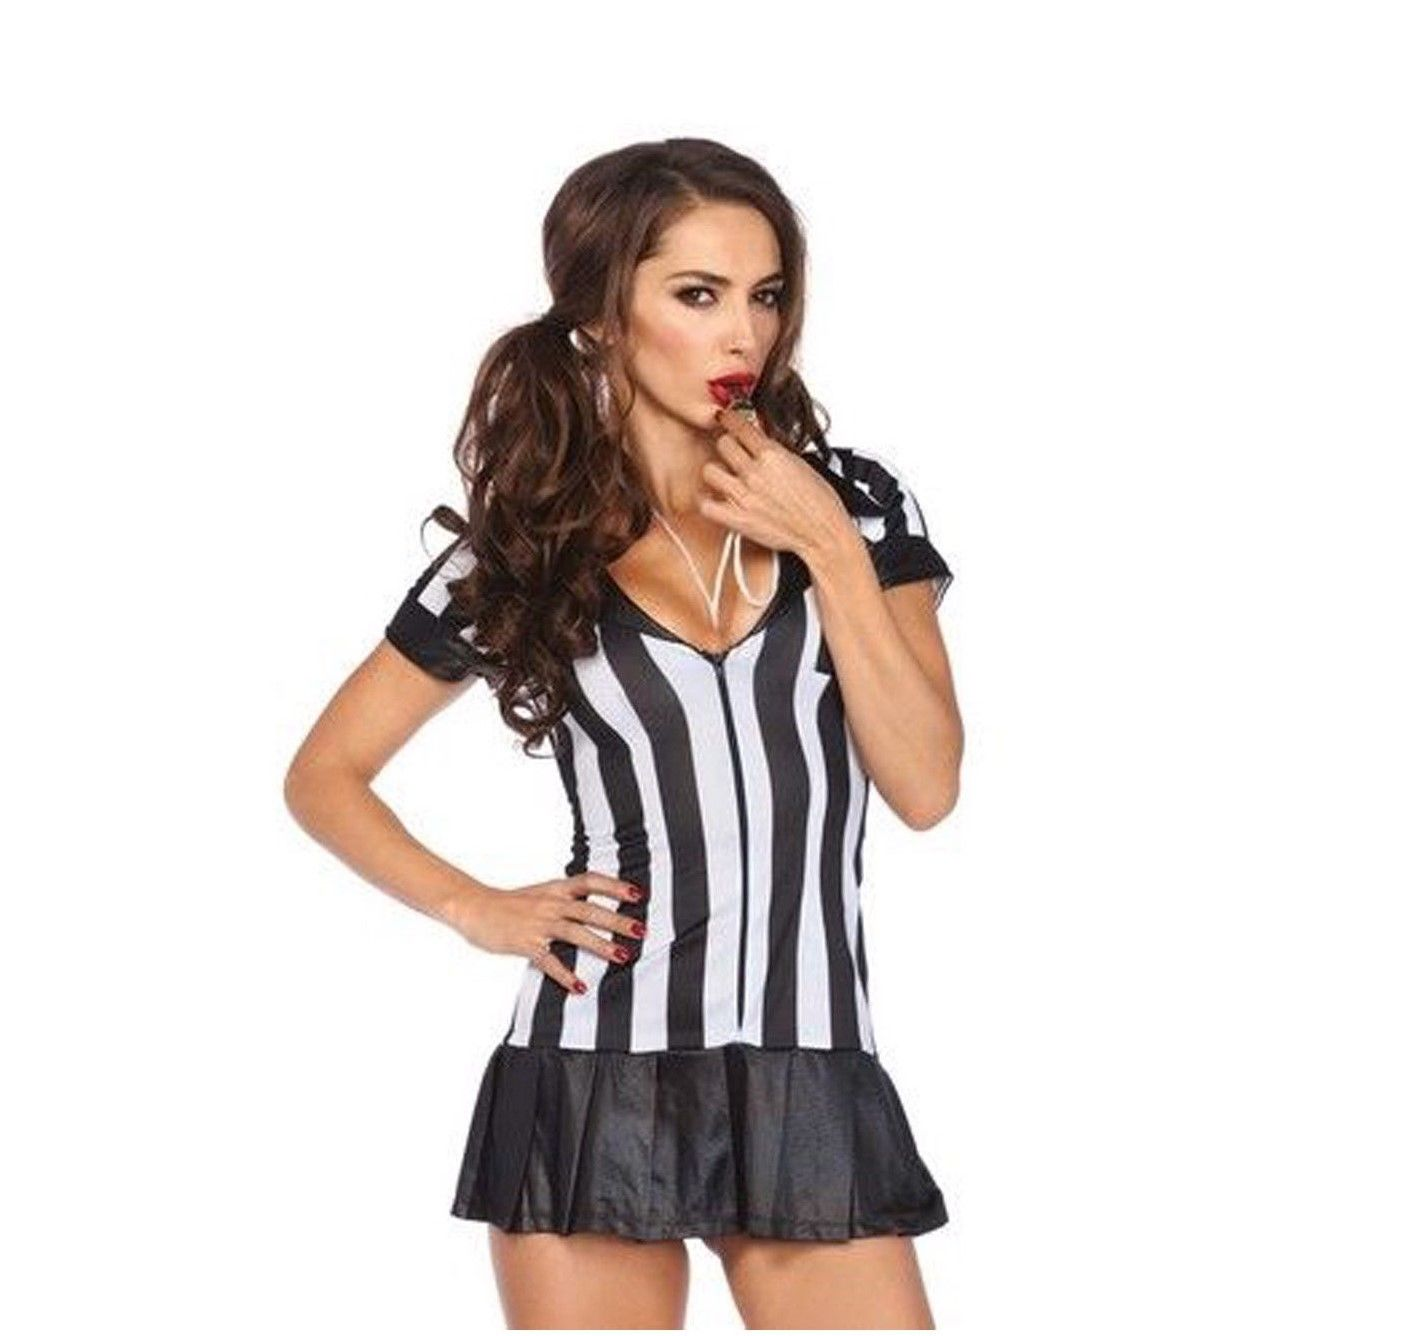 7d07703773279 Women s Game Official Sports Football Sexy Referee Halloween Costume Dress  Set